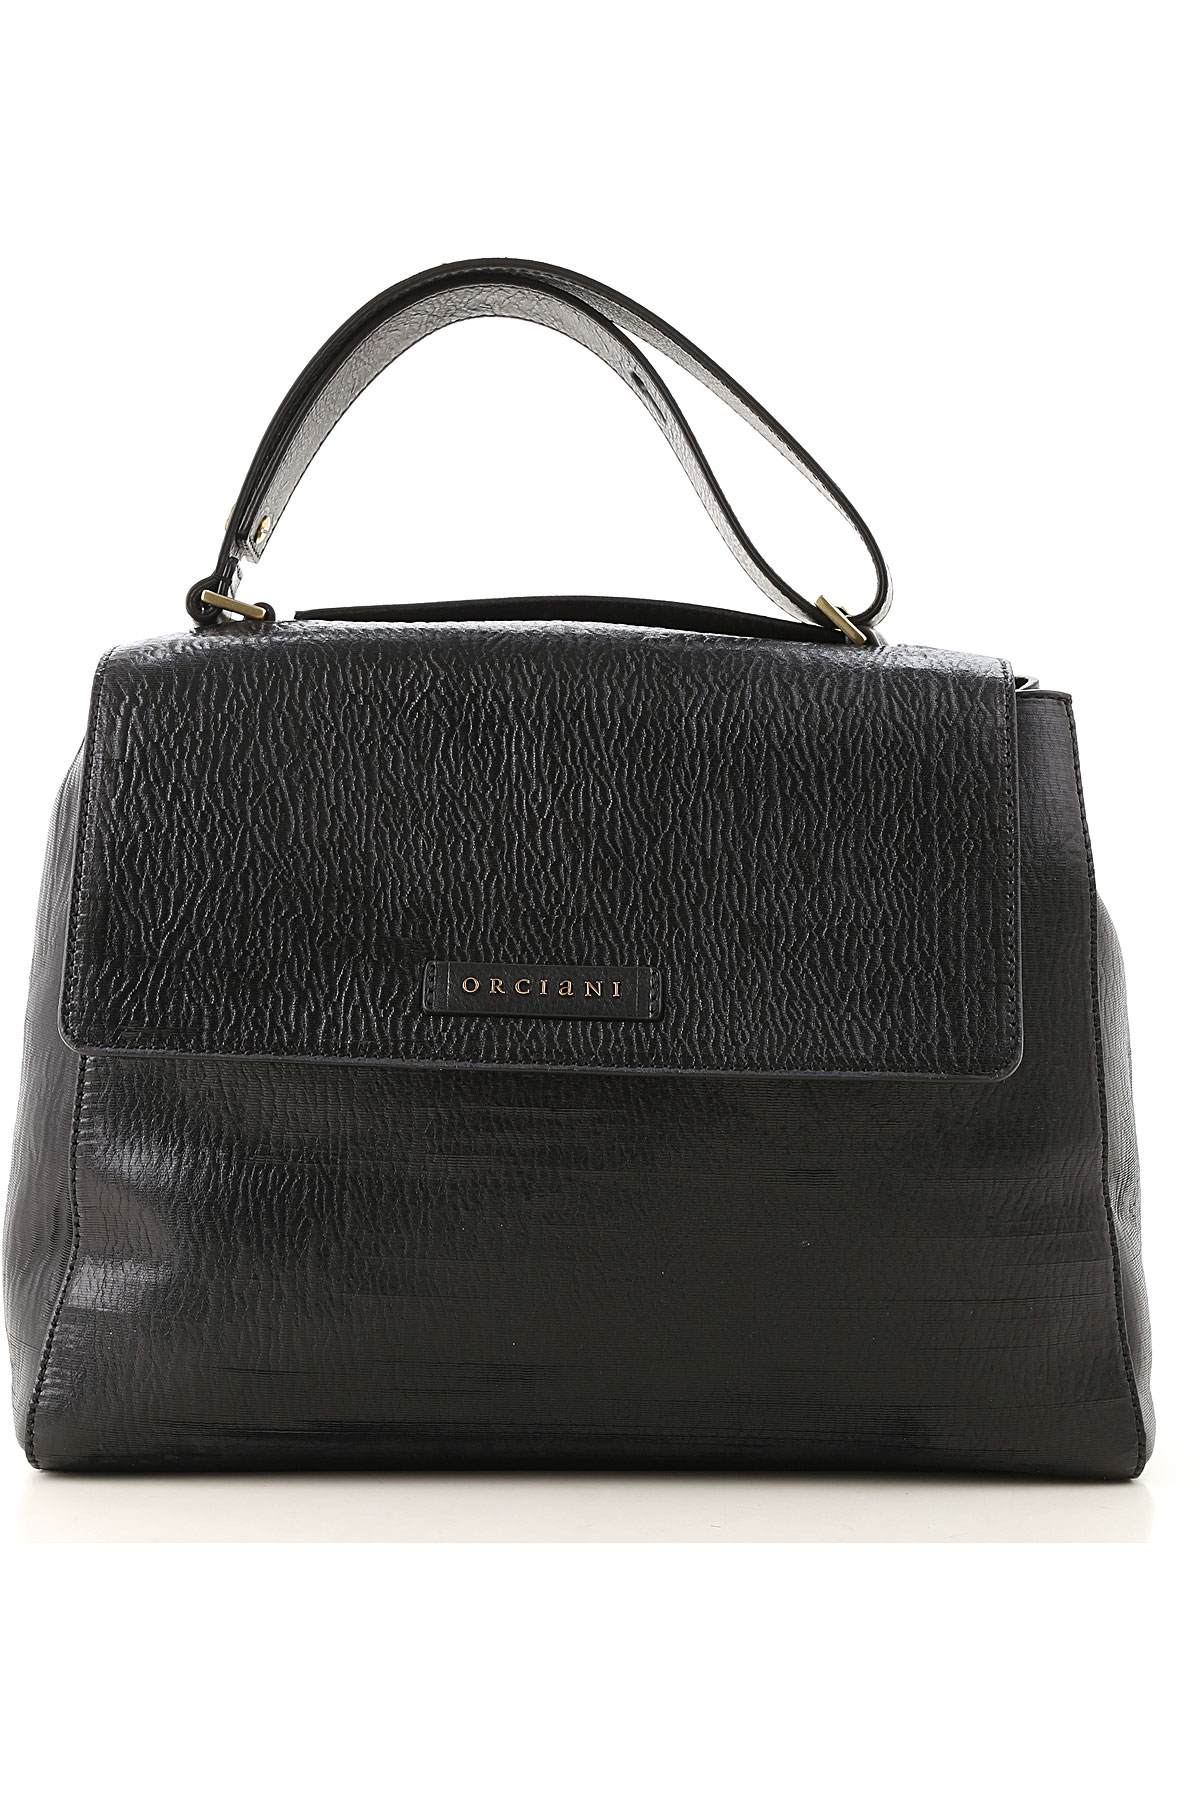 Orciani Top Handle Handbag On Sale, Black, Textured Leather, 2019